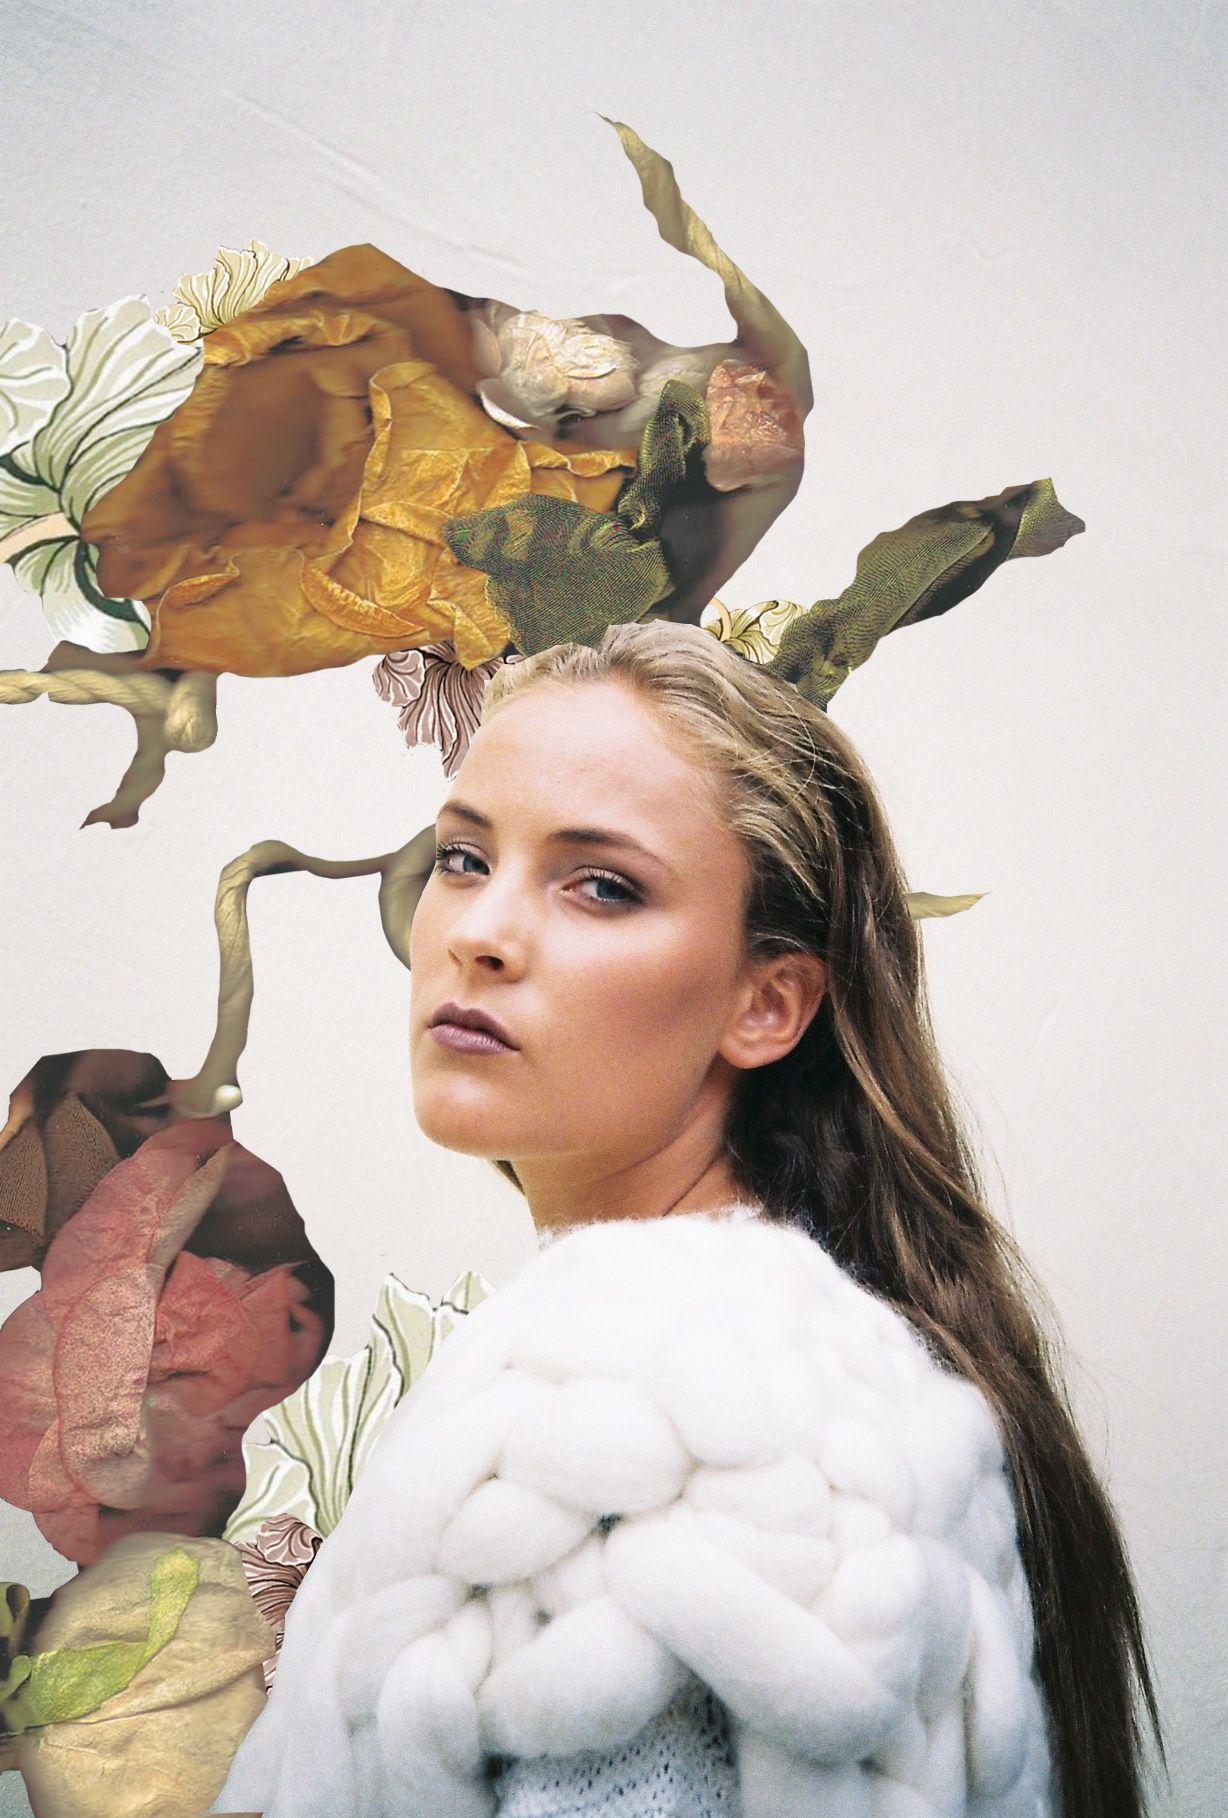 Amy Lidgett X Olivia Ogden #fashion #fashionphotography #photography #graphicdesign #photographer #model #shoot #fantasy #photoshoot #styling #art #collage #amylidgett #oliviaogden